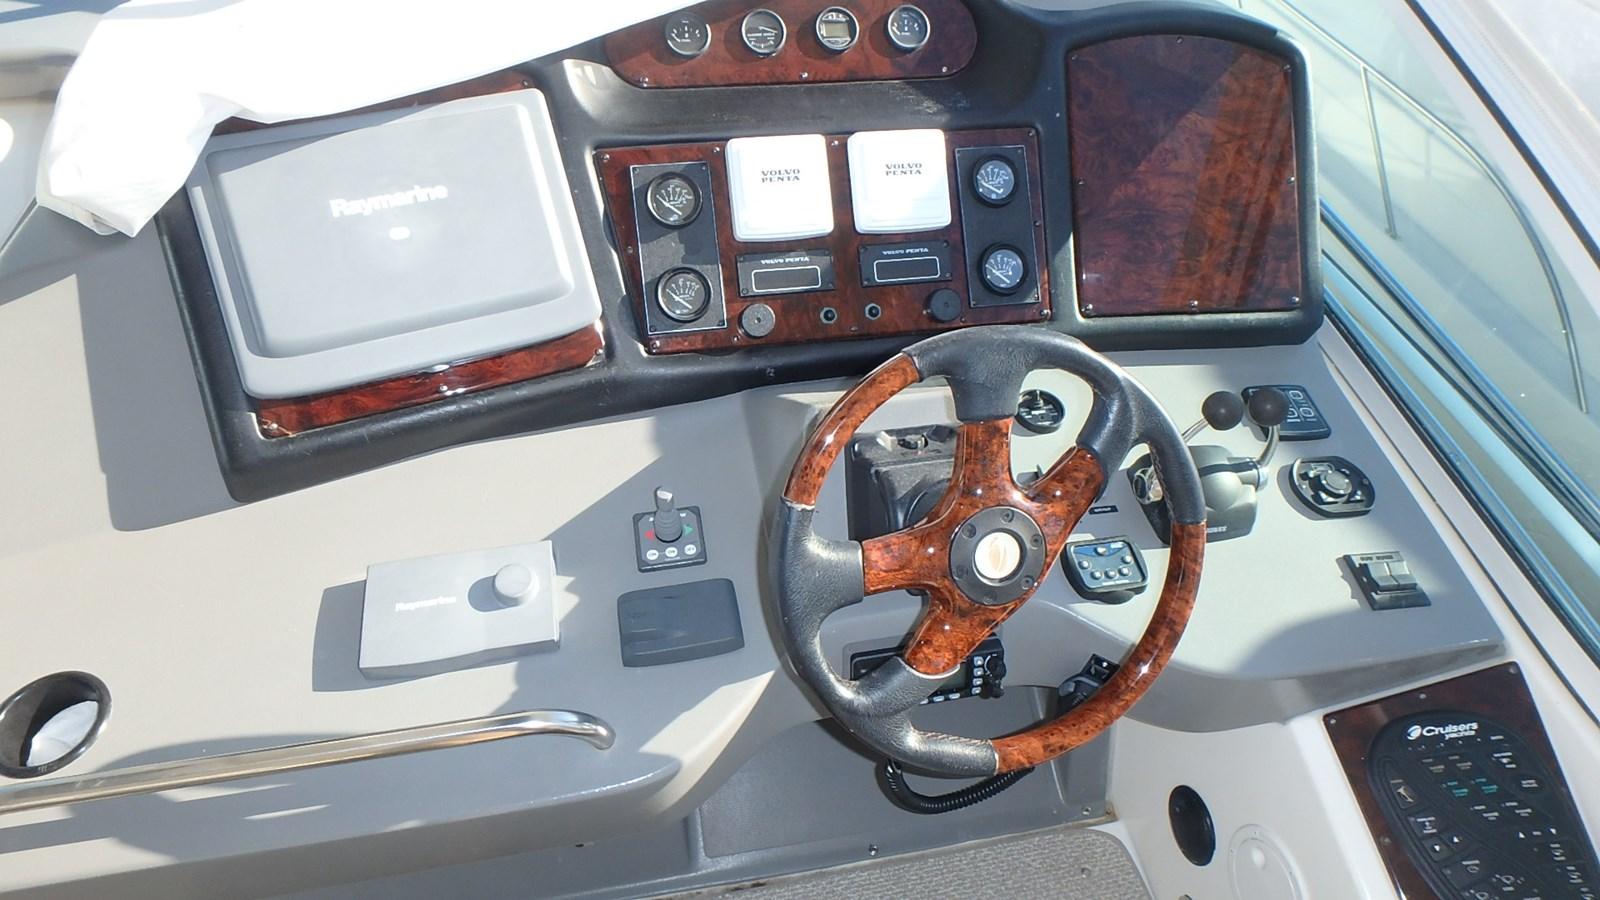 P1160971 2005 CRUISERS YACHTS 455 Express Motoryacht Motor Yacht 2522251